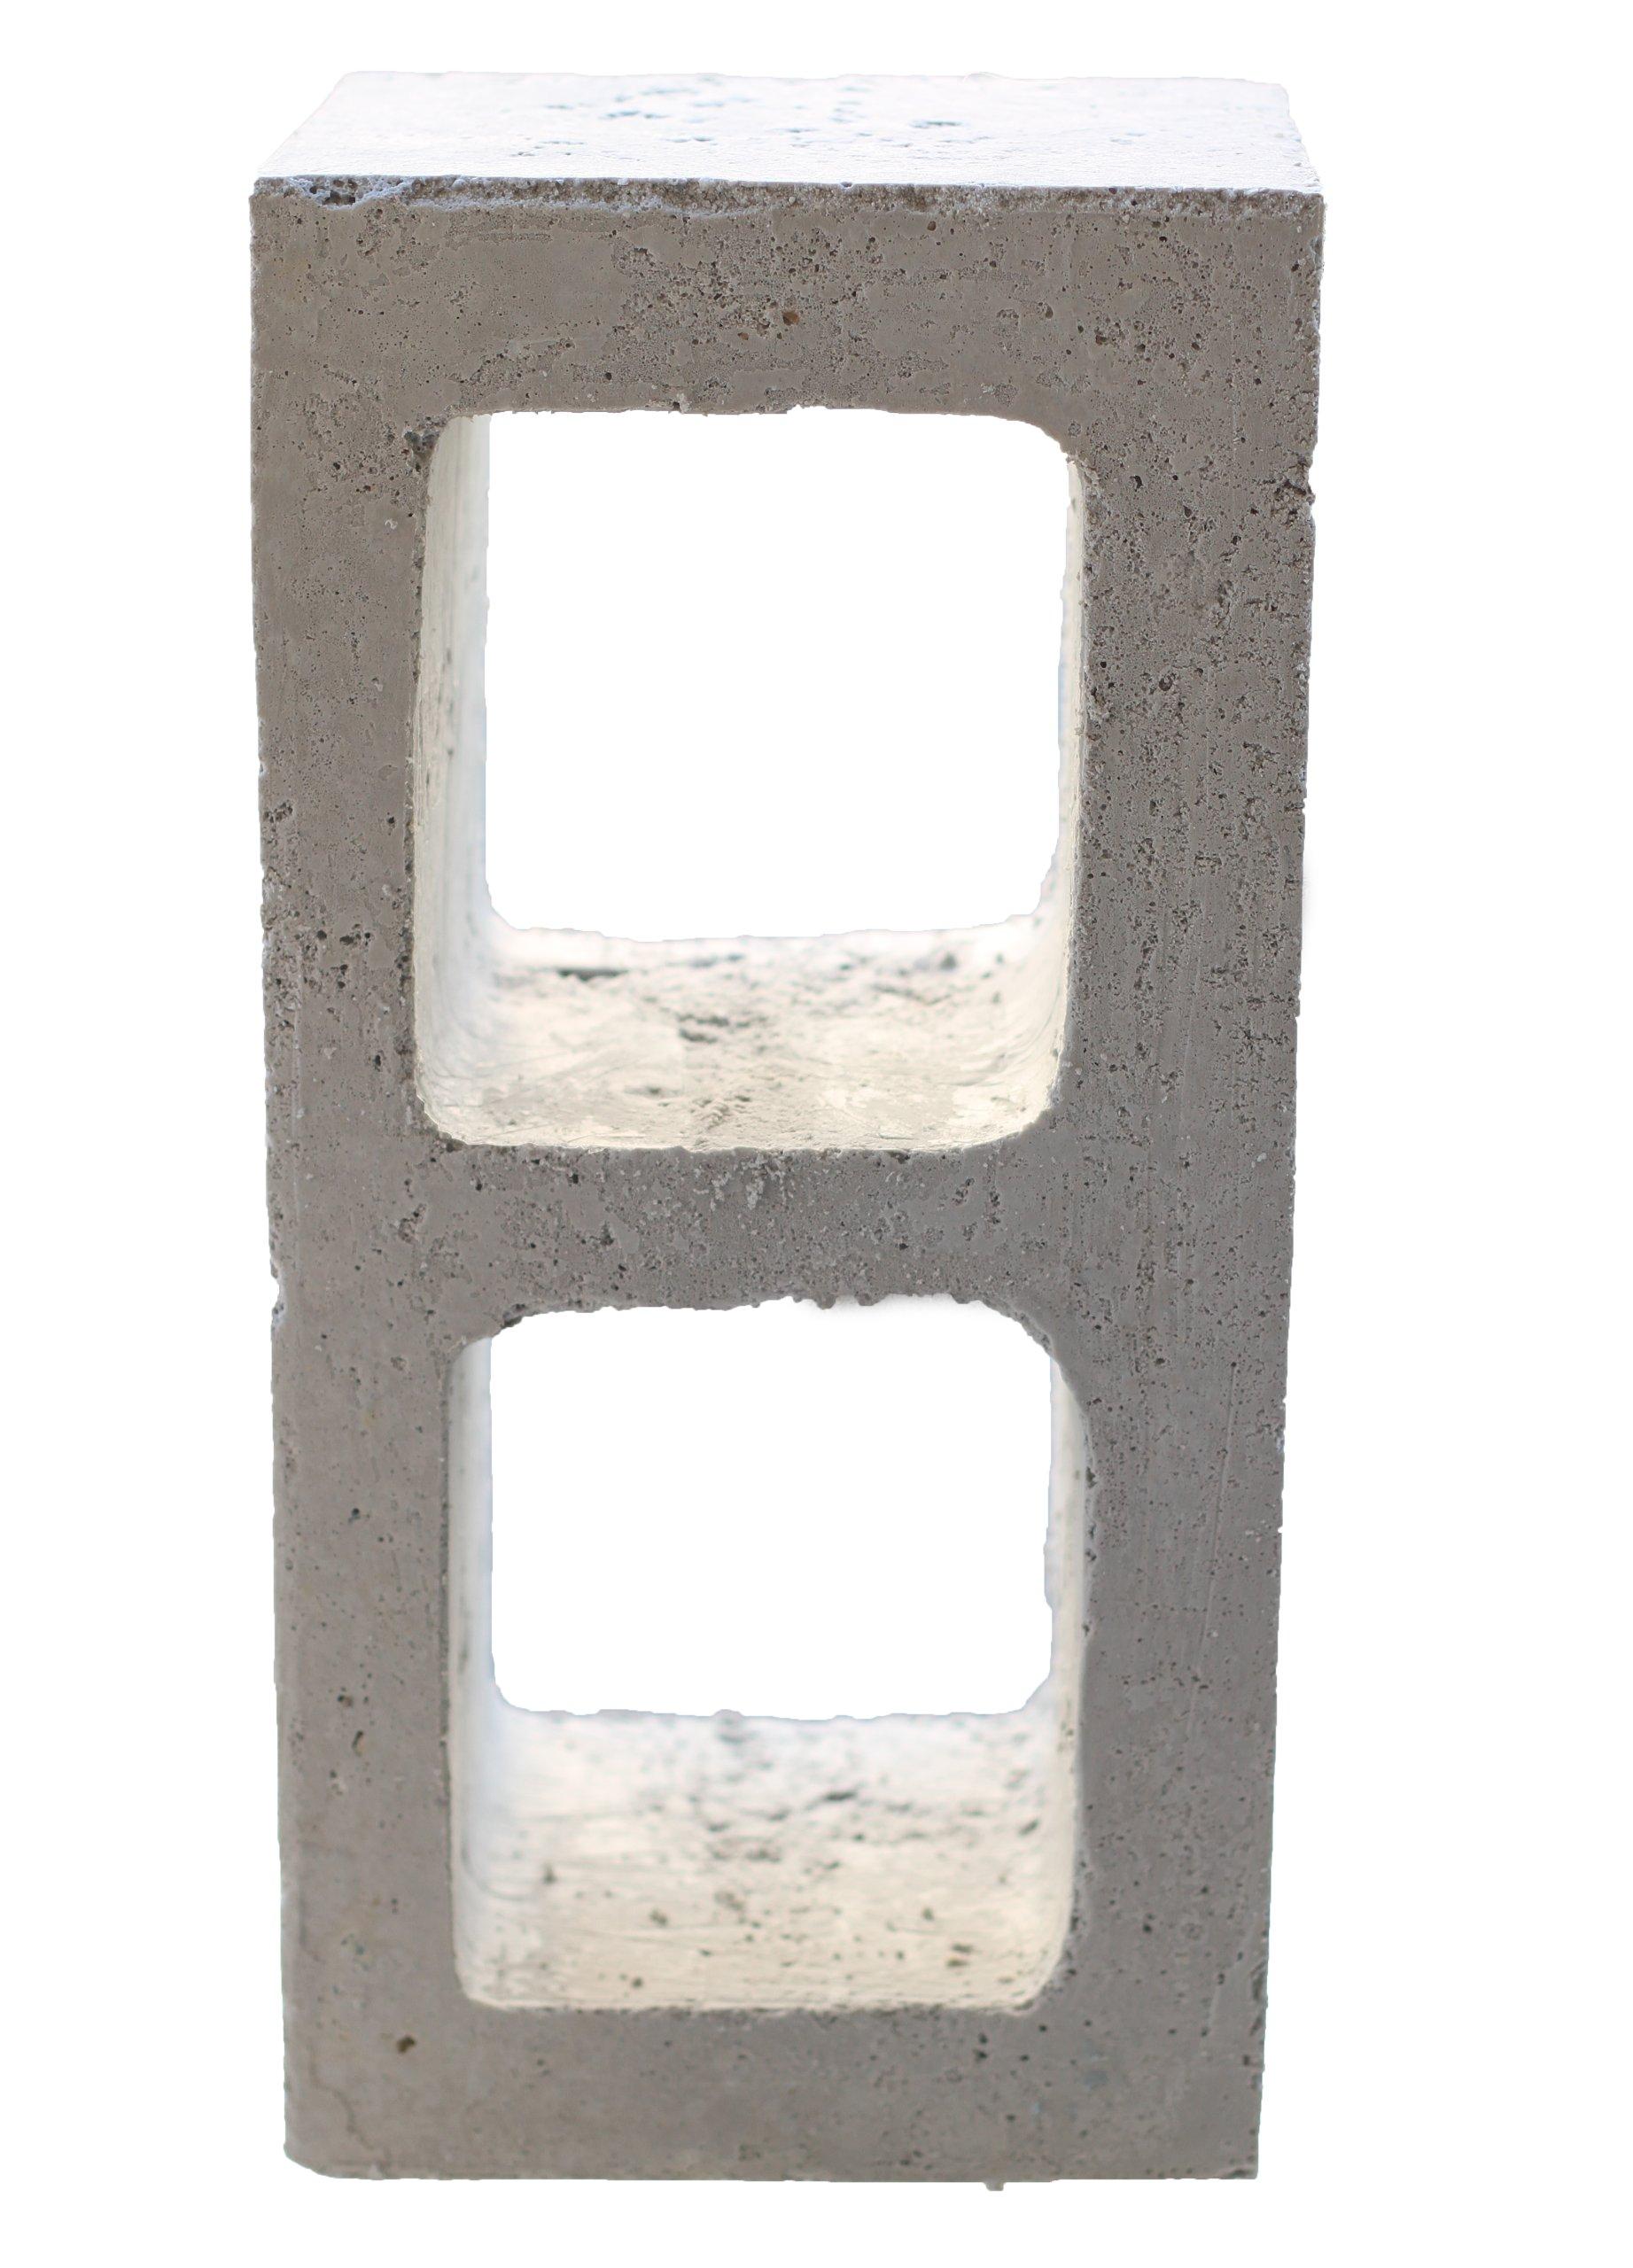 SMASHProps Breakaway Cinder Block by NewRuleFX (Image #1)